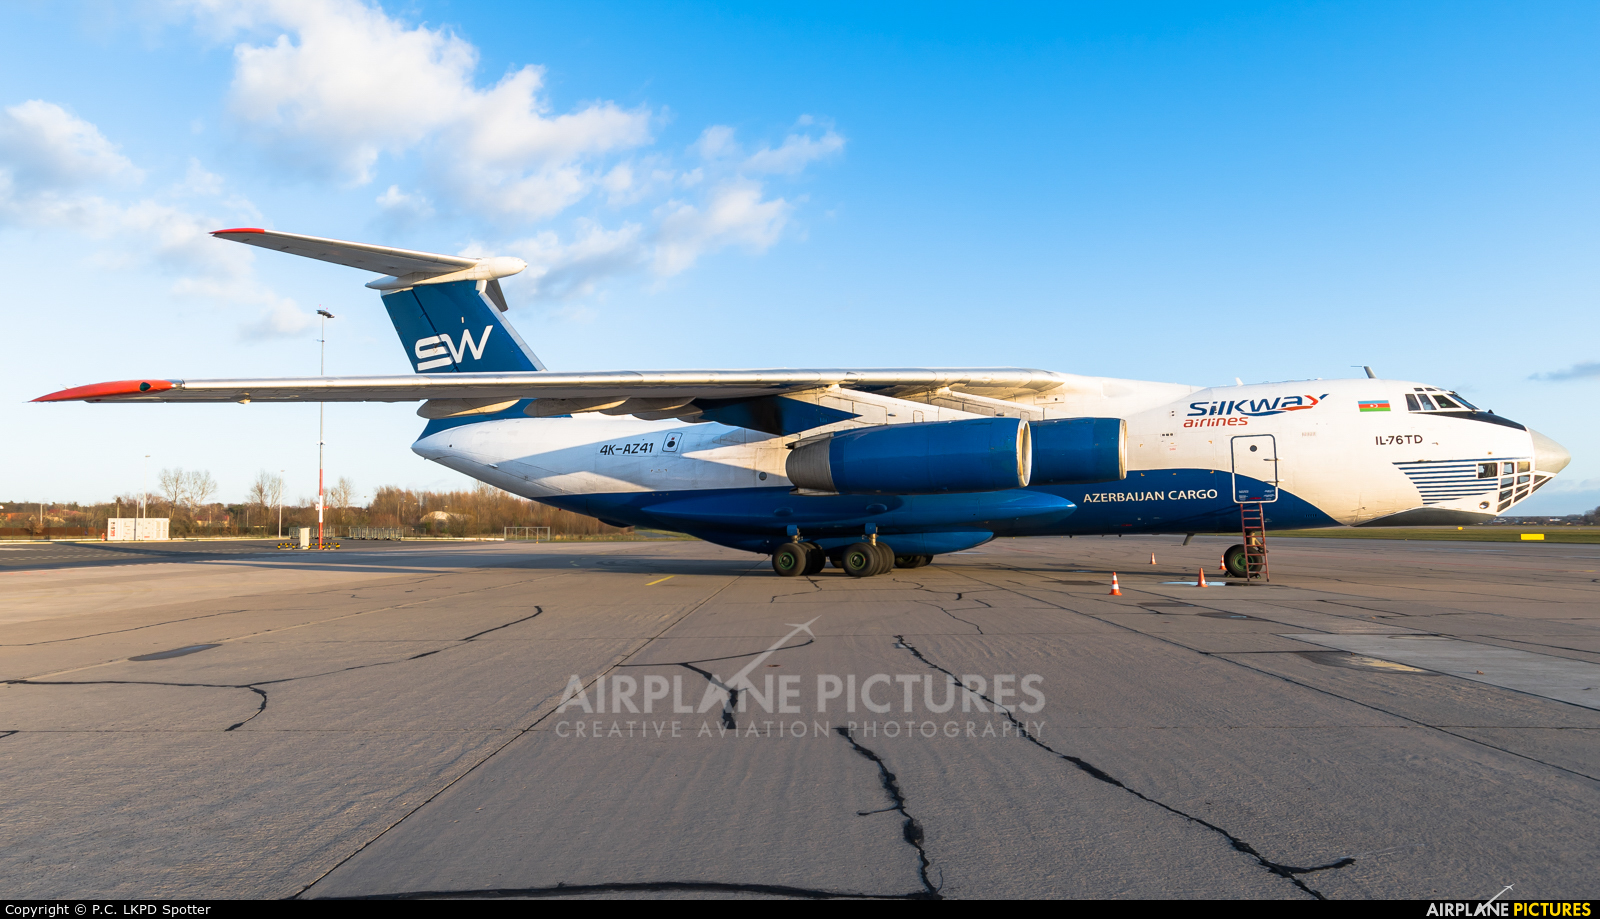 Silk Way Airlines 4K-AZ41 aircraft at Pardubice